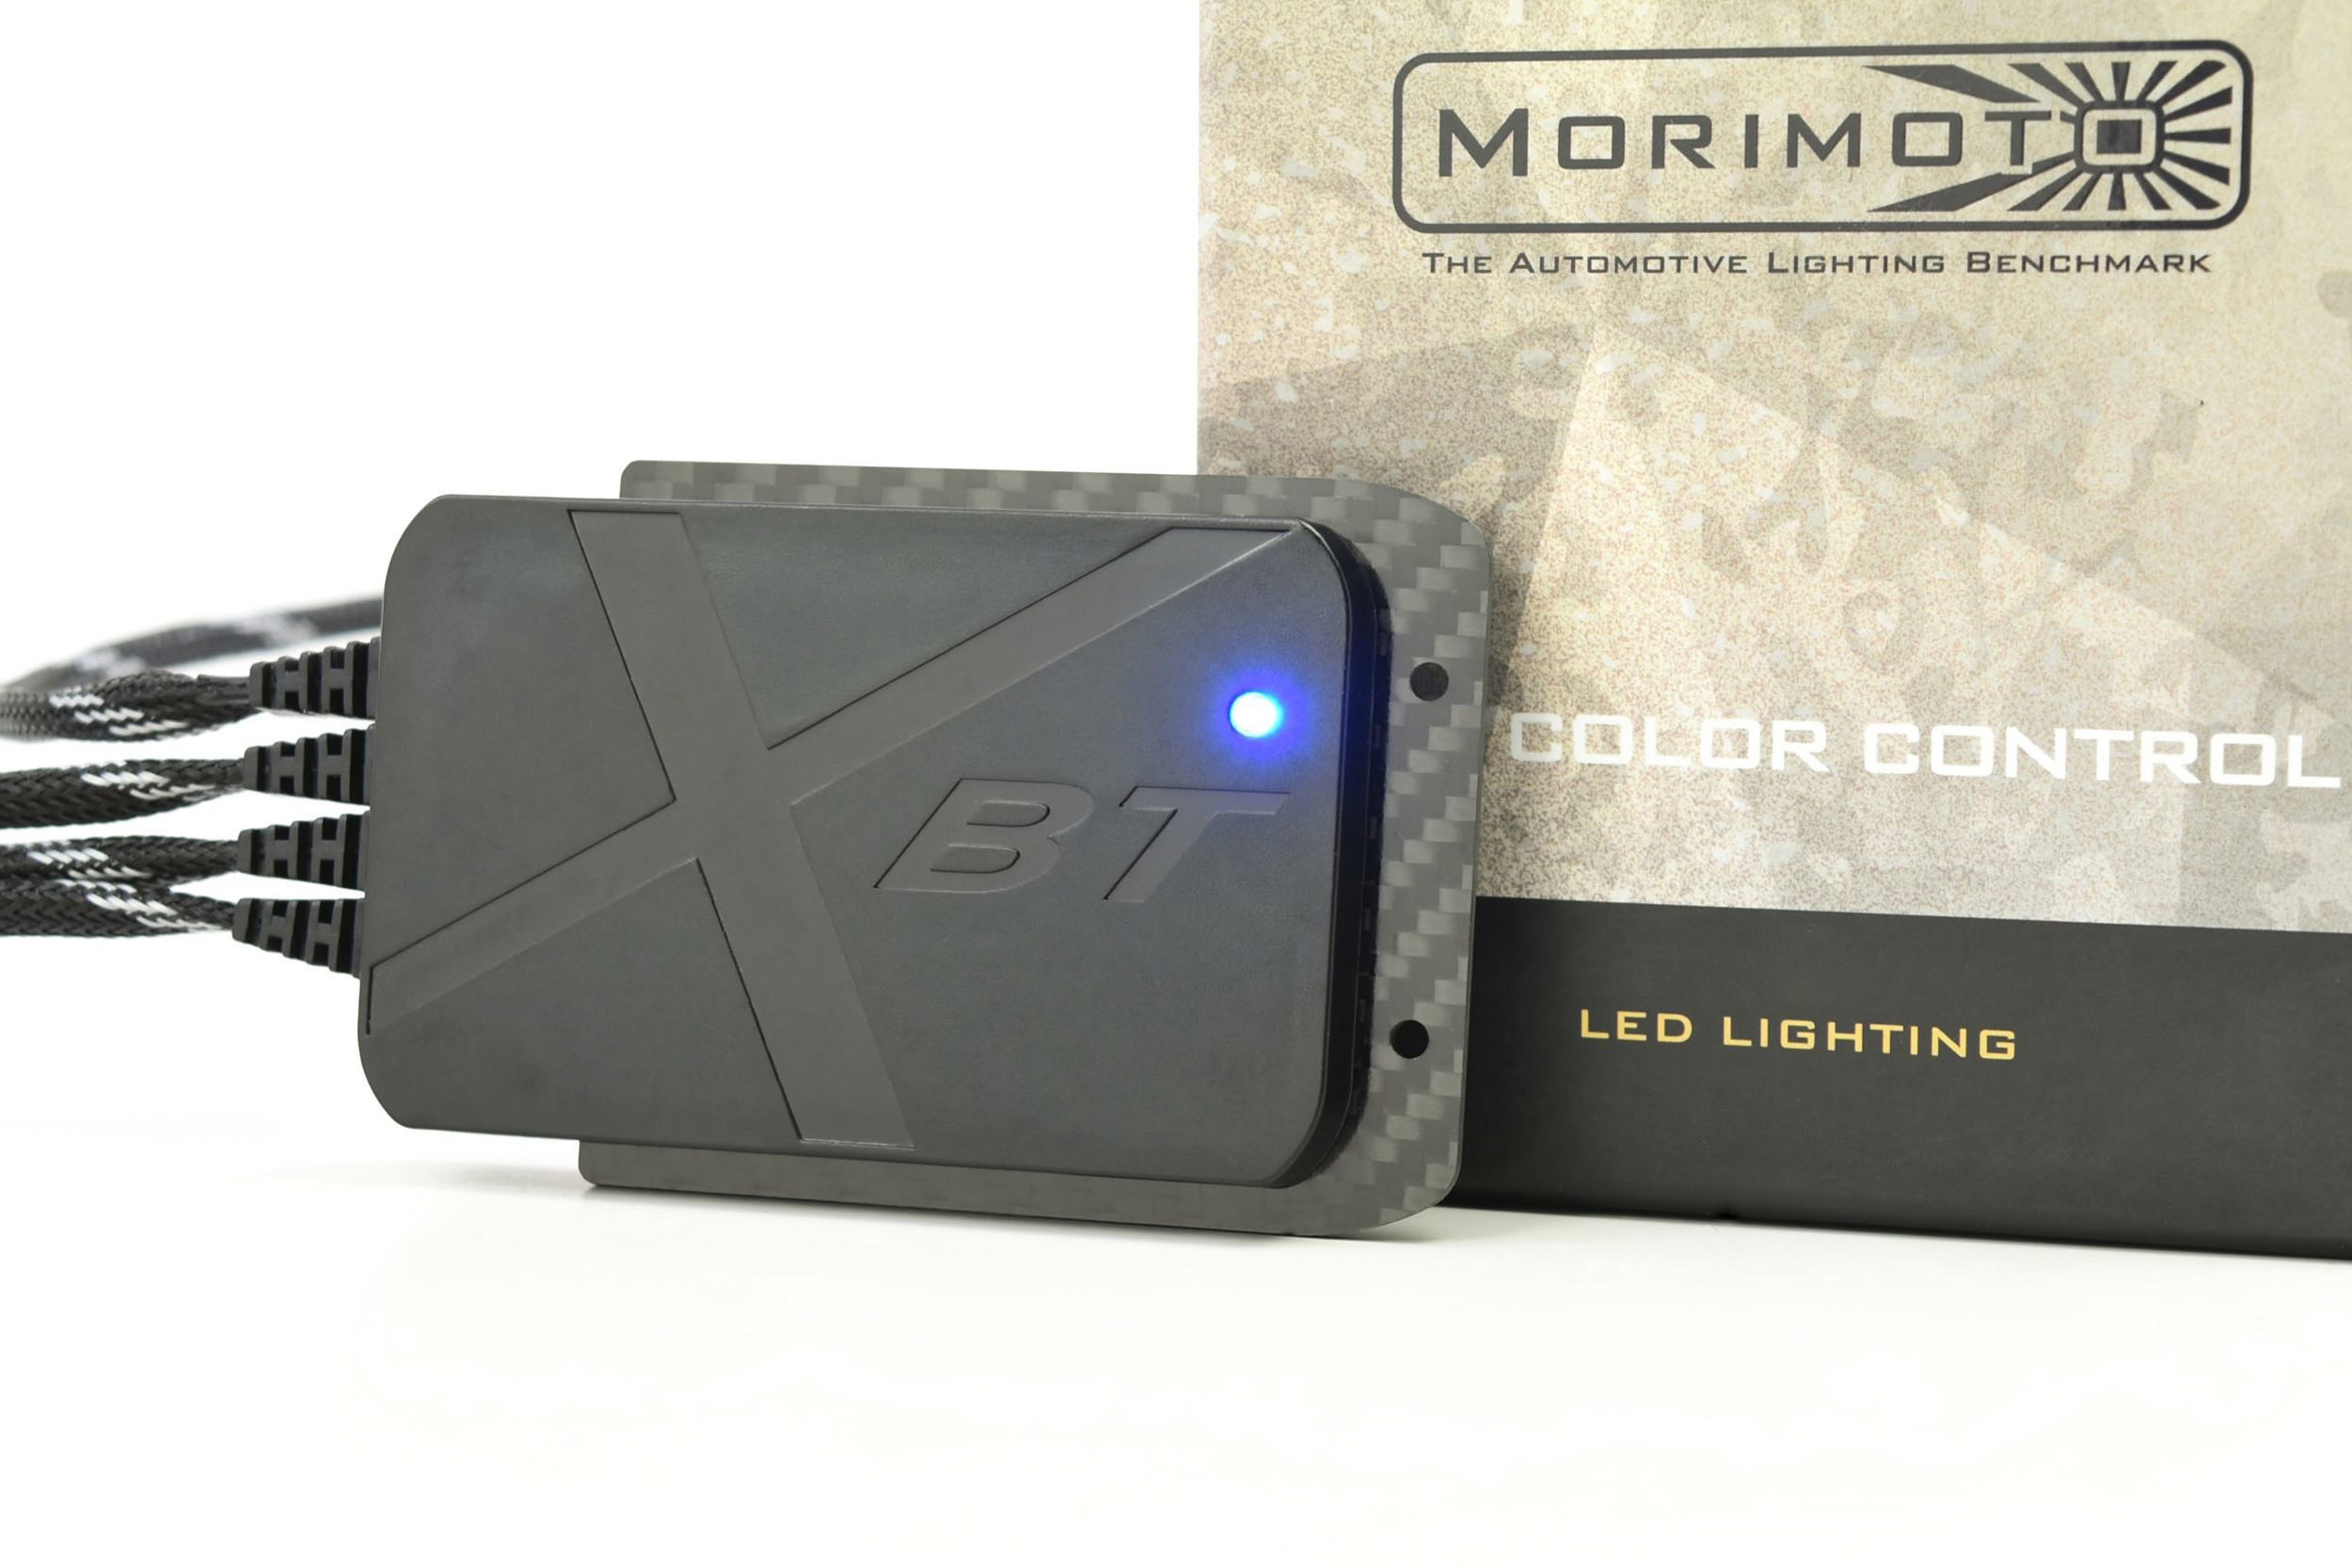 Morimoto XBT RGB LED Bluetooth Headlight Controller 1